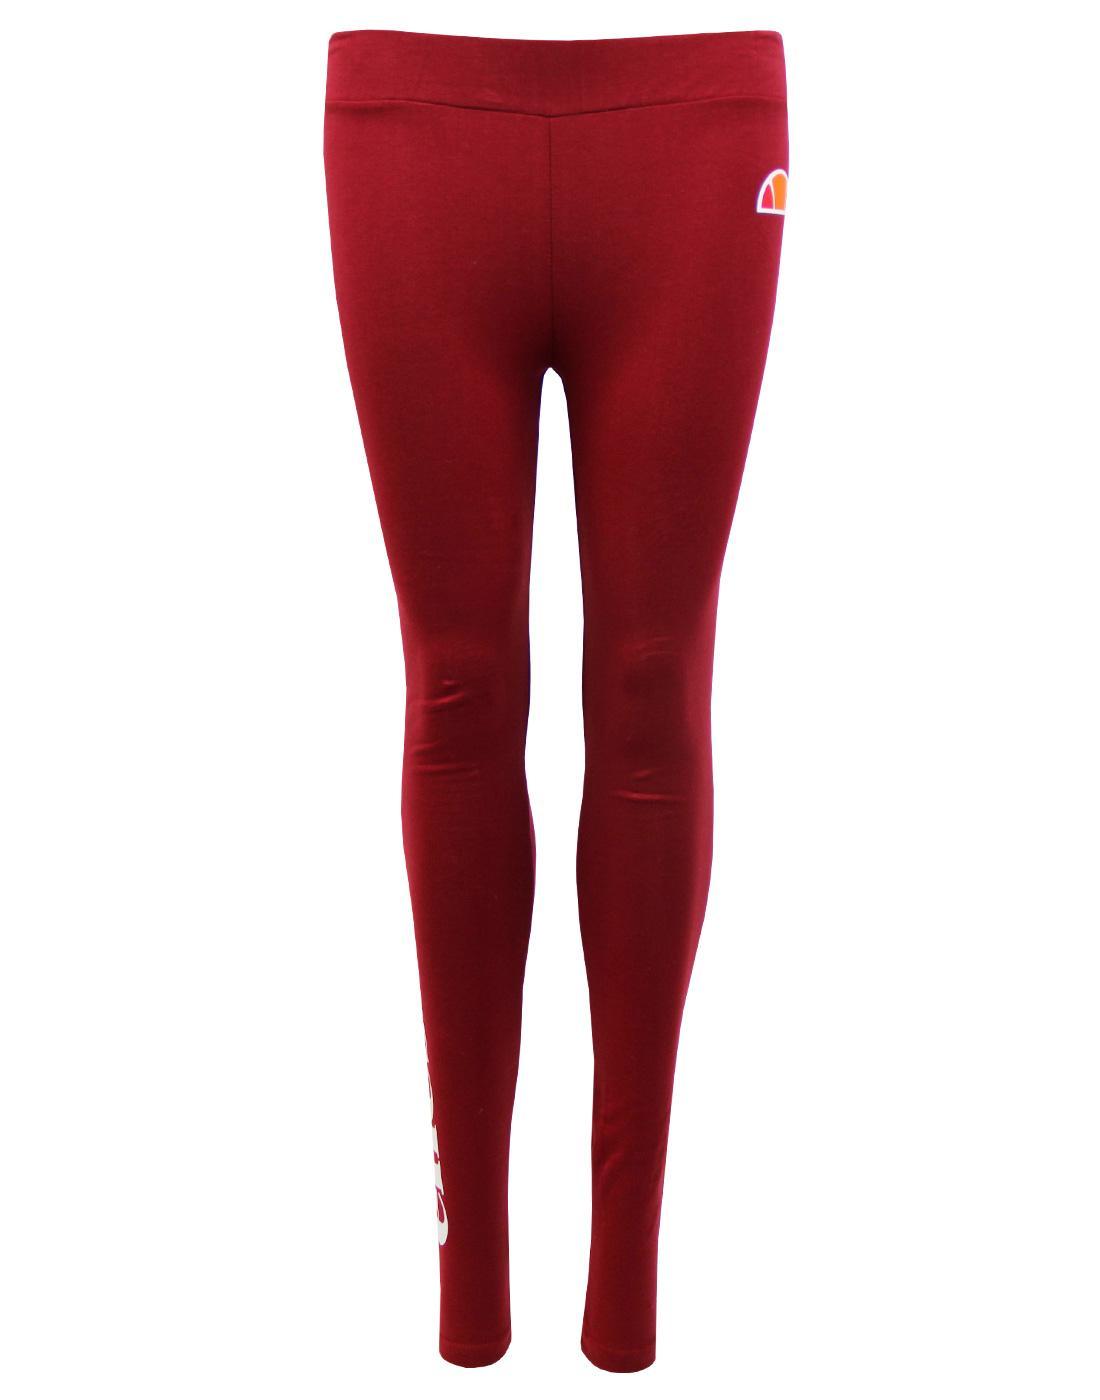 Solos ELLESSE WOMENS Retro 80s Logo Leggings RED